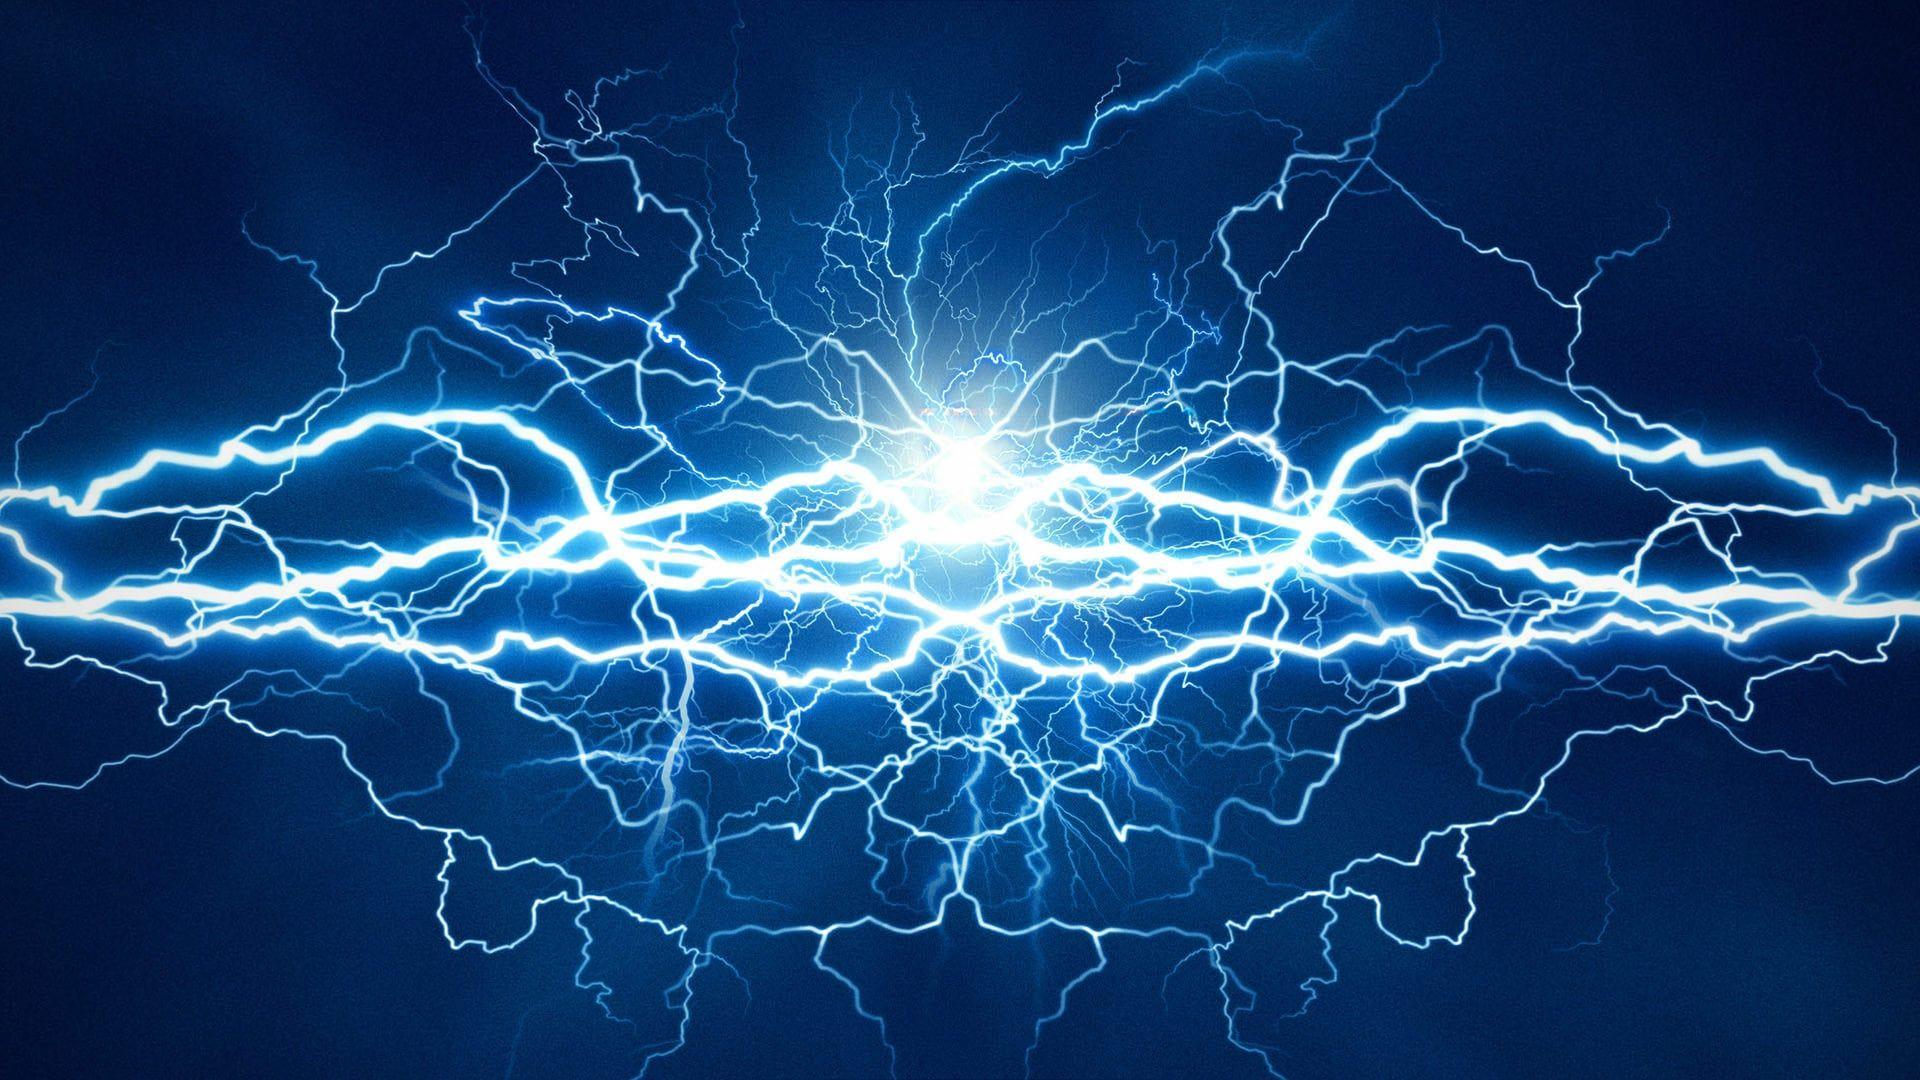 Lightning Bolt HD Download